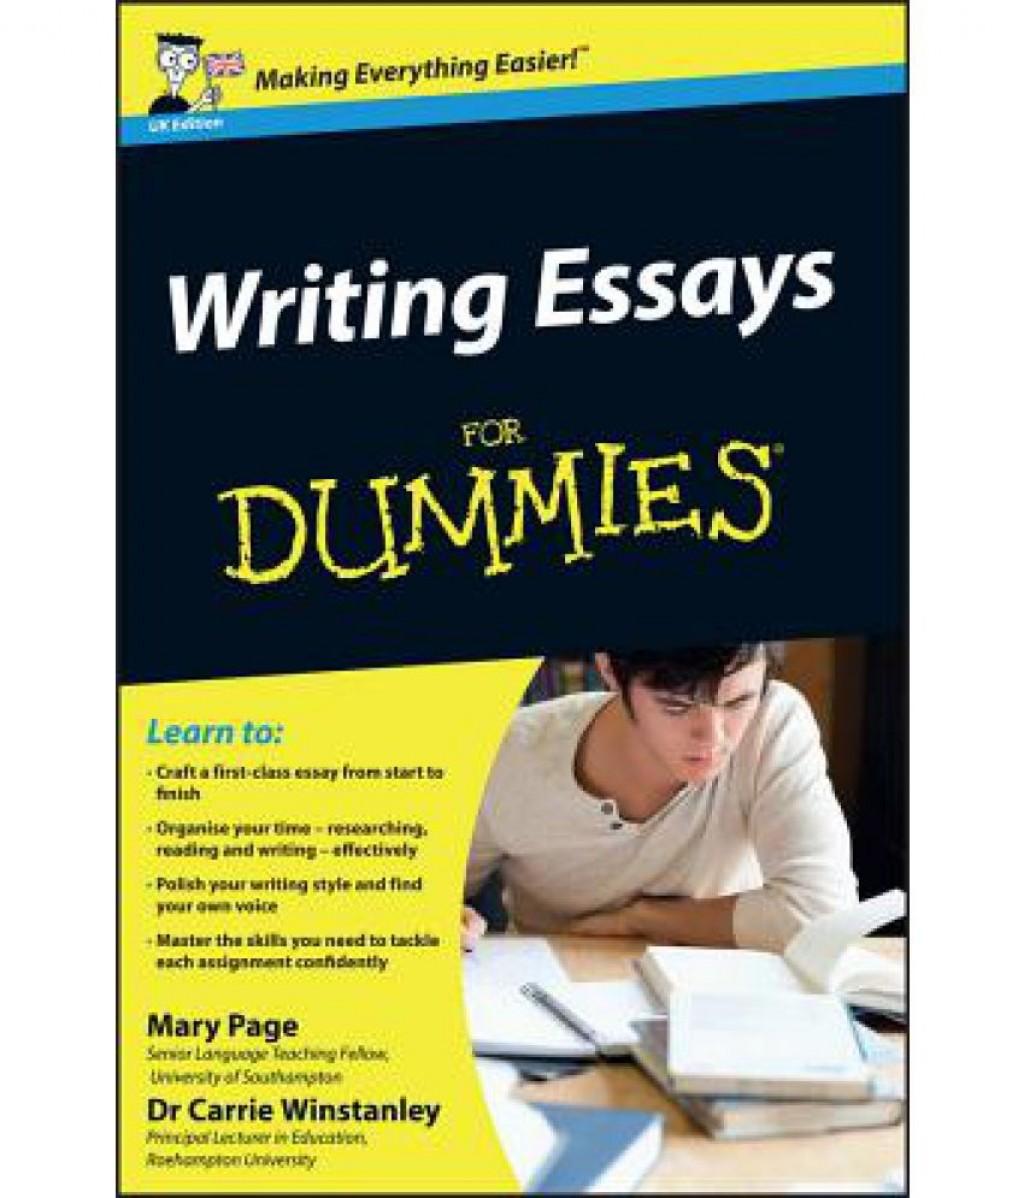 003 Writing Essays For Dummies Sdl427789710 Essay Wondrous Pdf Free Download Cheat Sheet Large